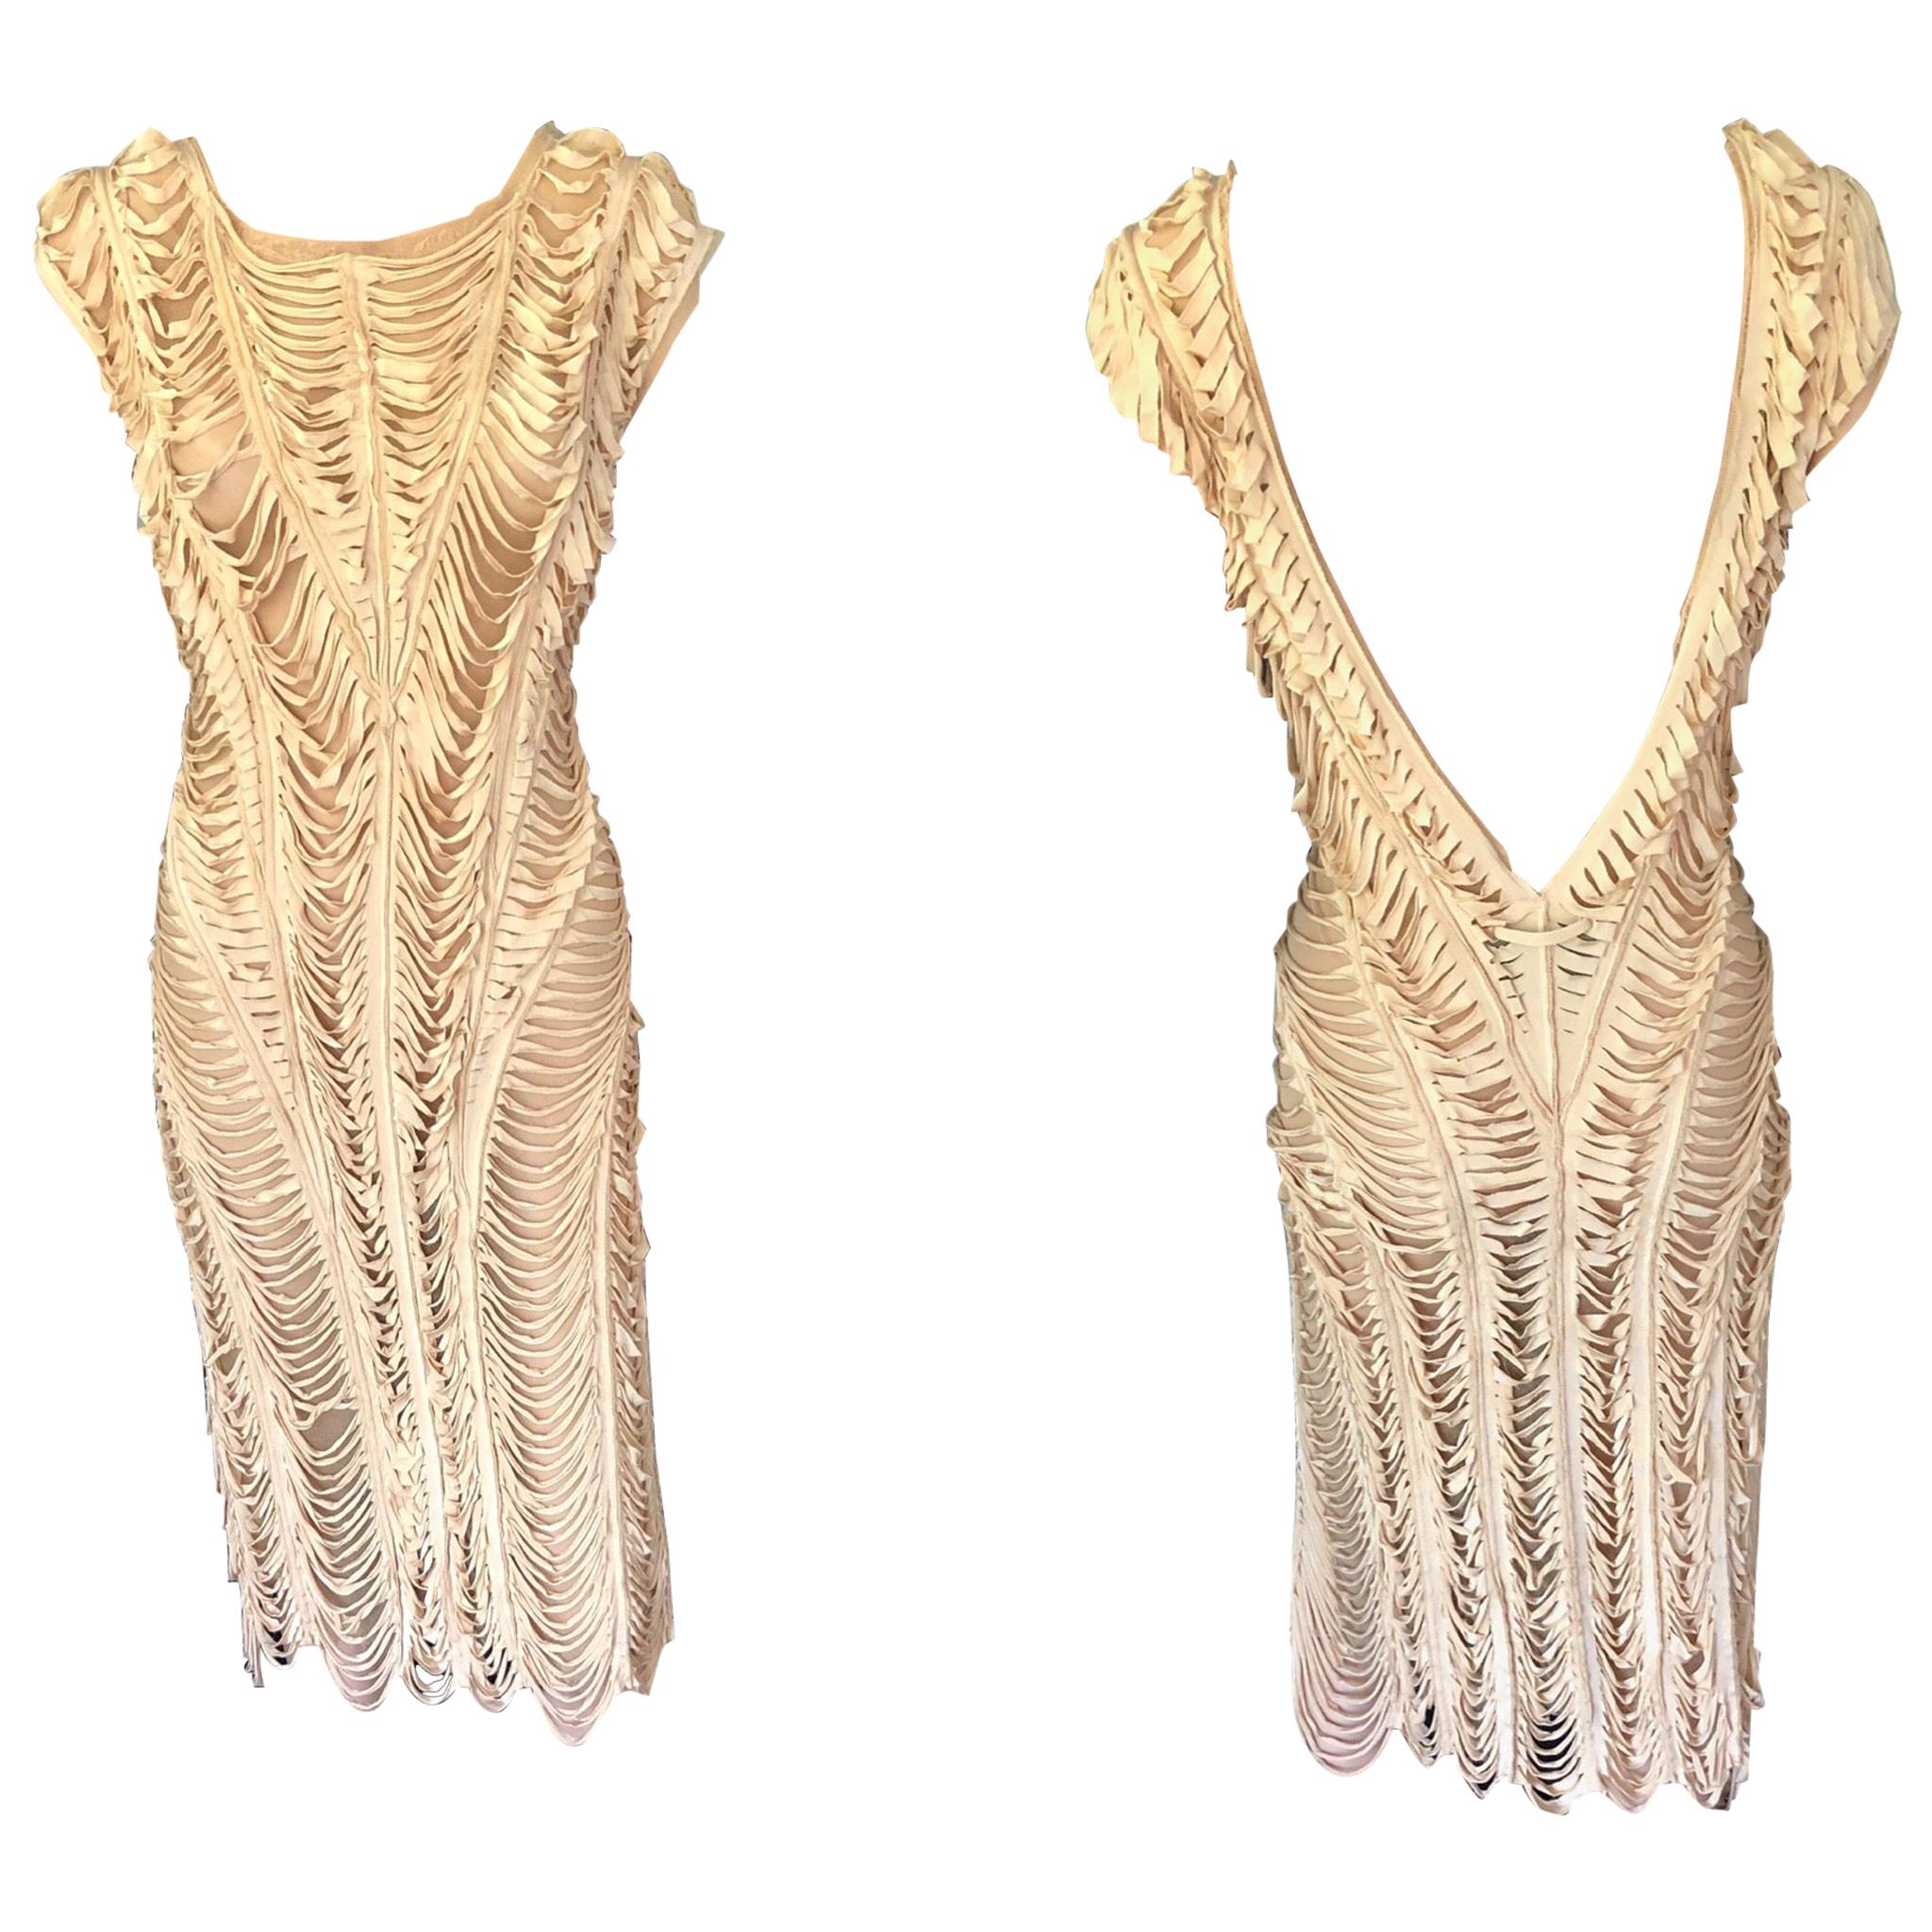 Jean Paul Gaultier c.1990 Vintage Cutout Fringe Mesh Open Back Dress